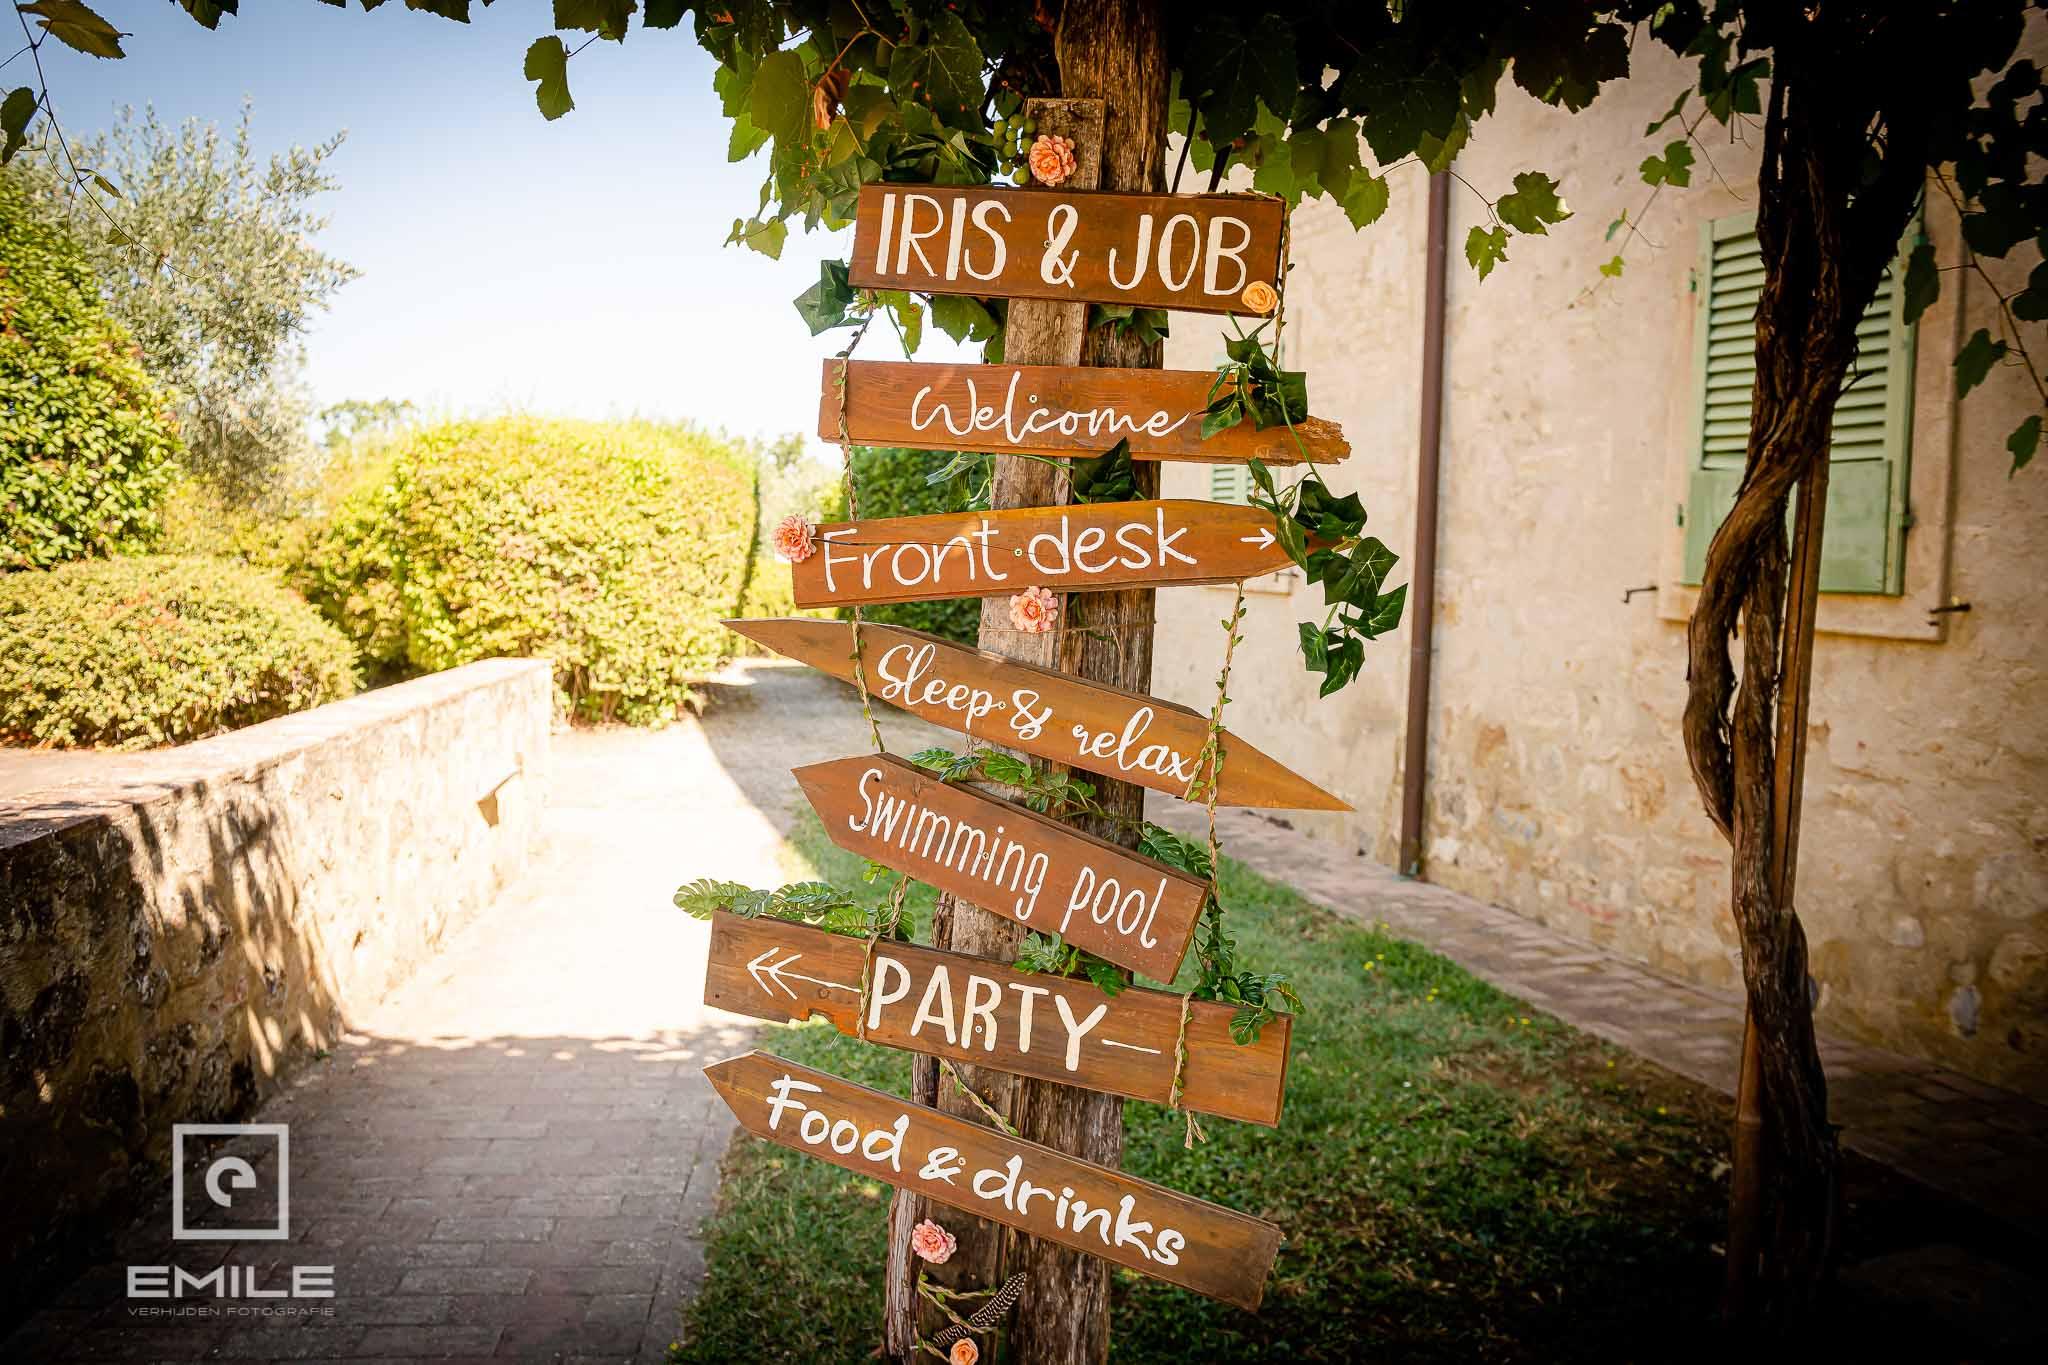 Bordjes met bewijzering - Destination wedding San Gimignano - Toscane Italie - Iris en Job